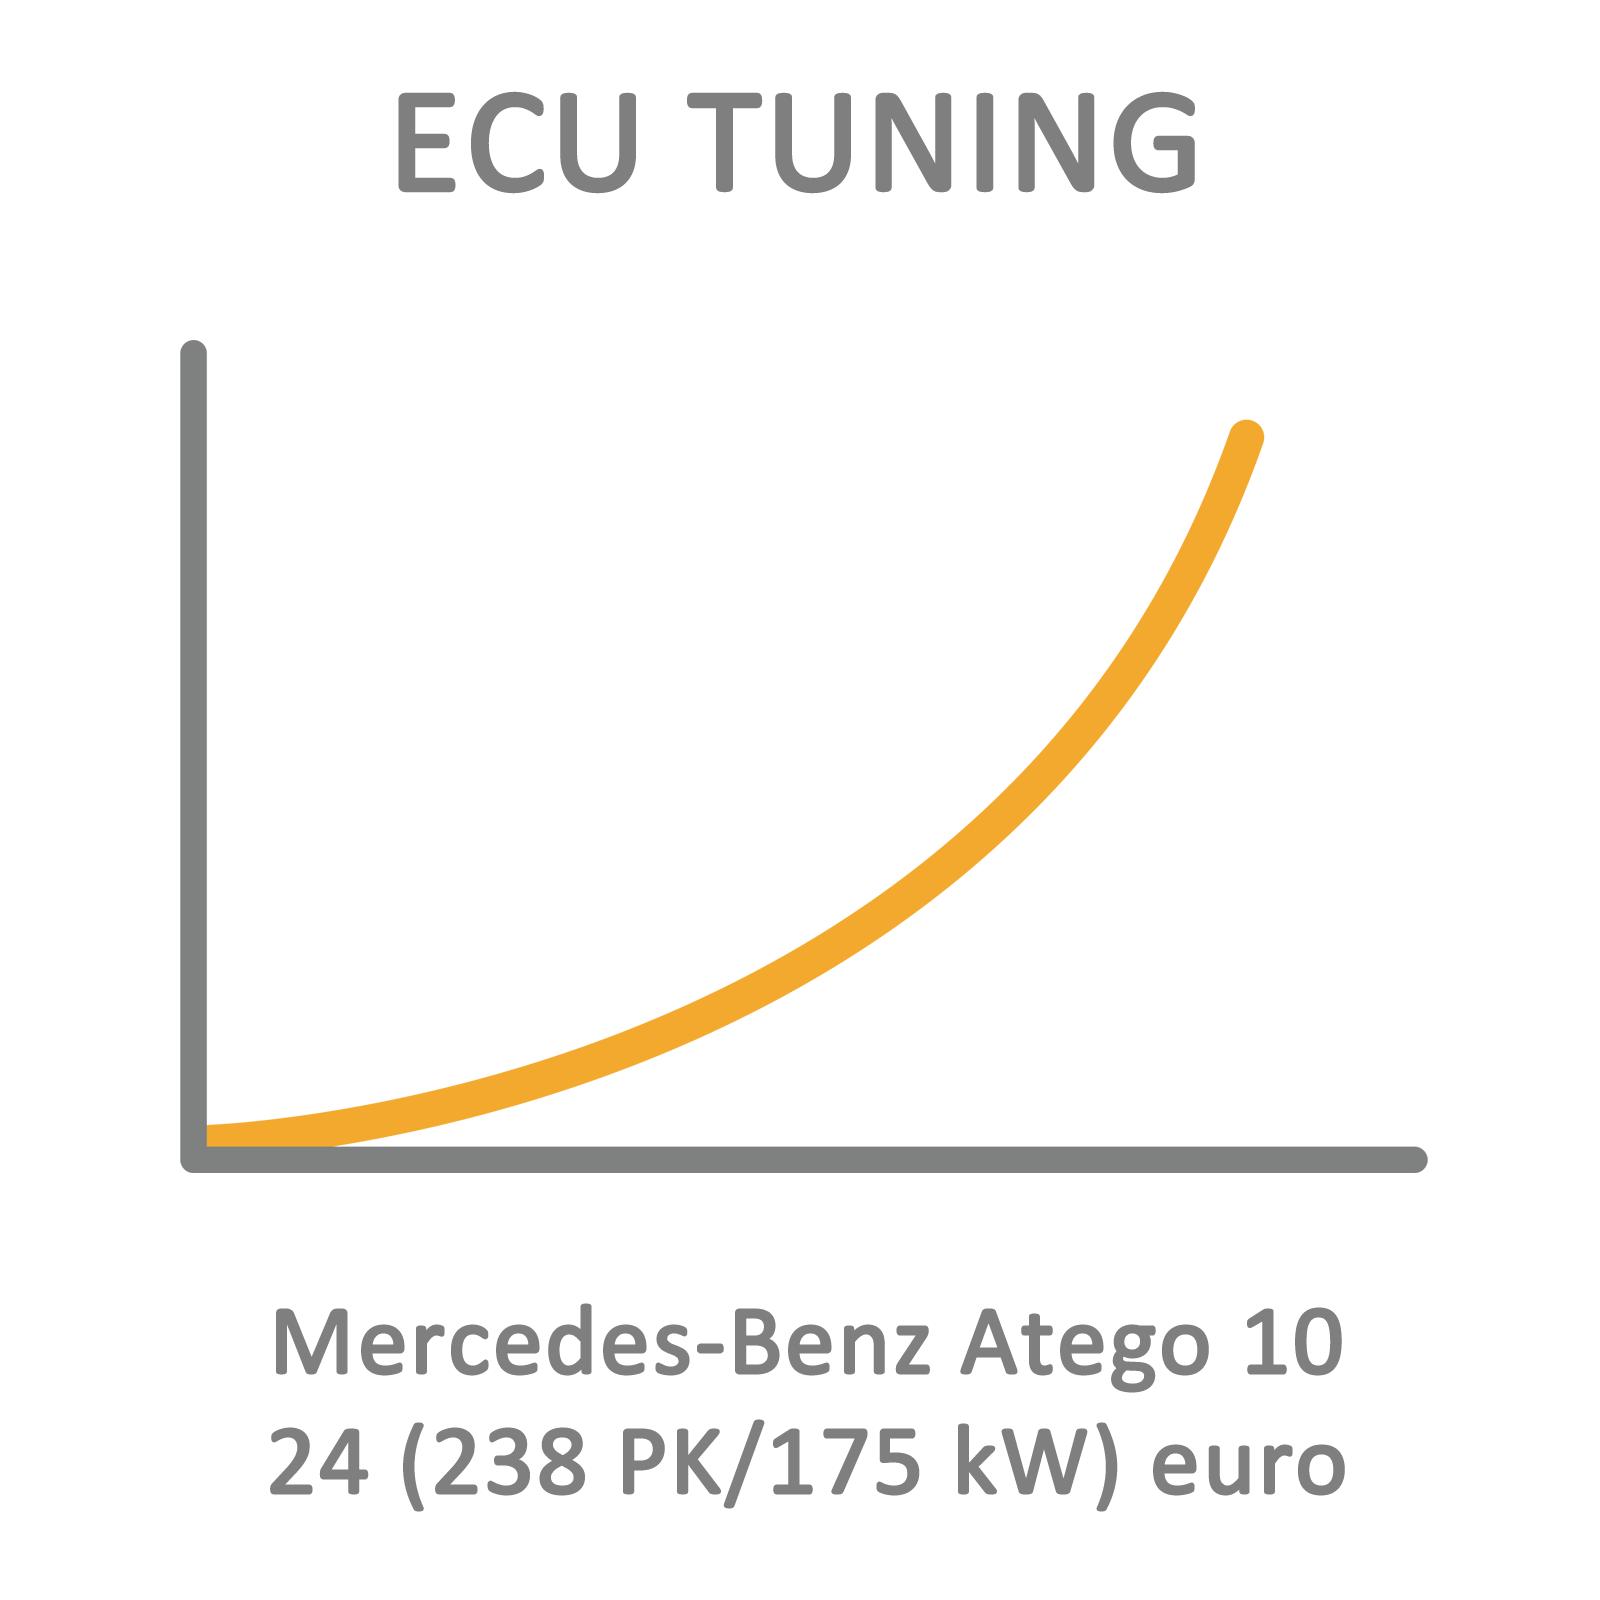 Mercedes-Benz Atego 10 24 (238 PK/175 kW) euro 4+5 ECU